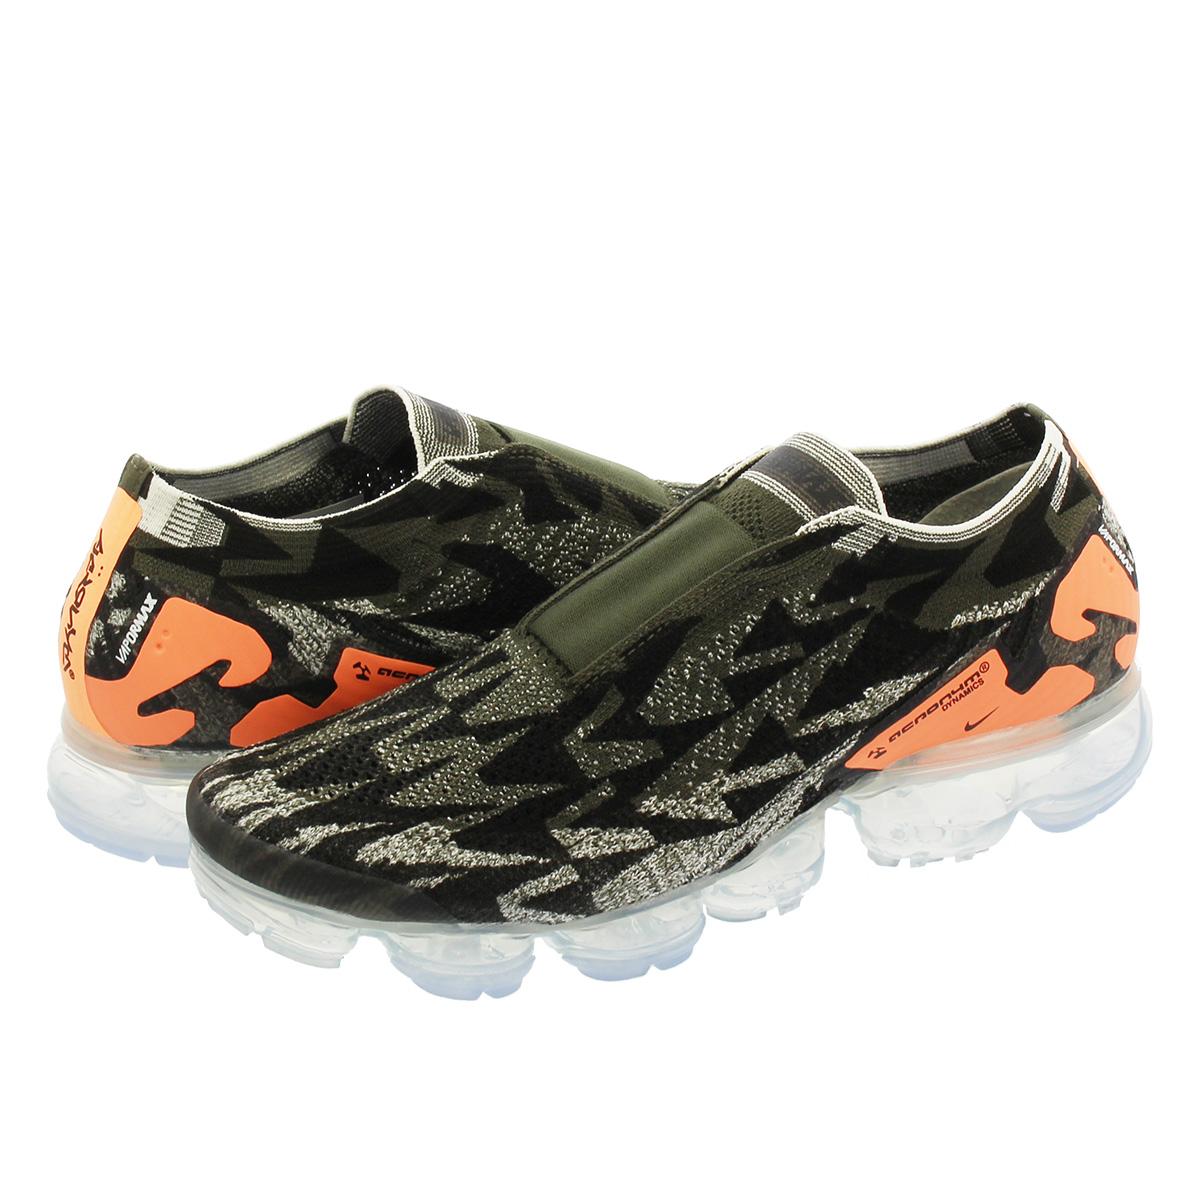 048cae443f78 SELECT SHOP LOWTEX  NIKE X ACRONYM AIR VAPORMAX MOC 2 Nike X  アクロニウムエアヴェイパーマックスモック 2 SAIL CARGO KHAKI DARK STUCCO aq0996-102